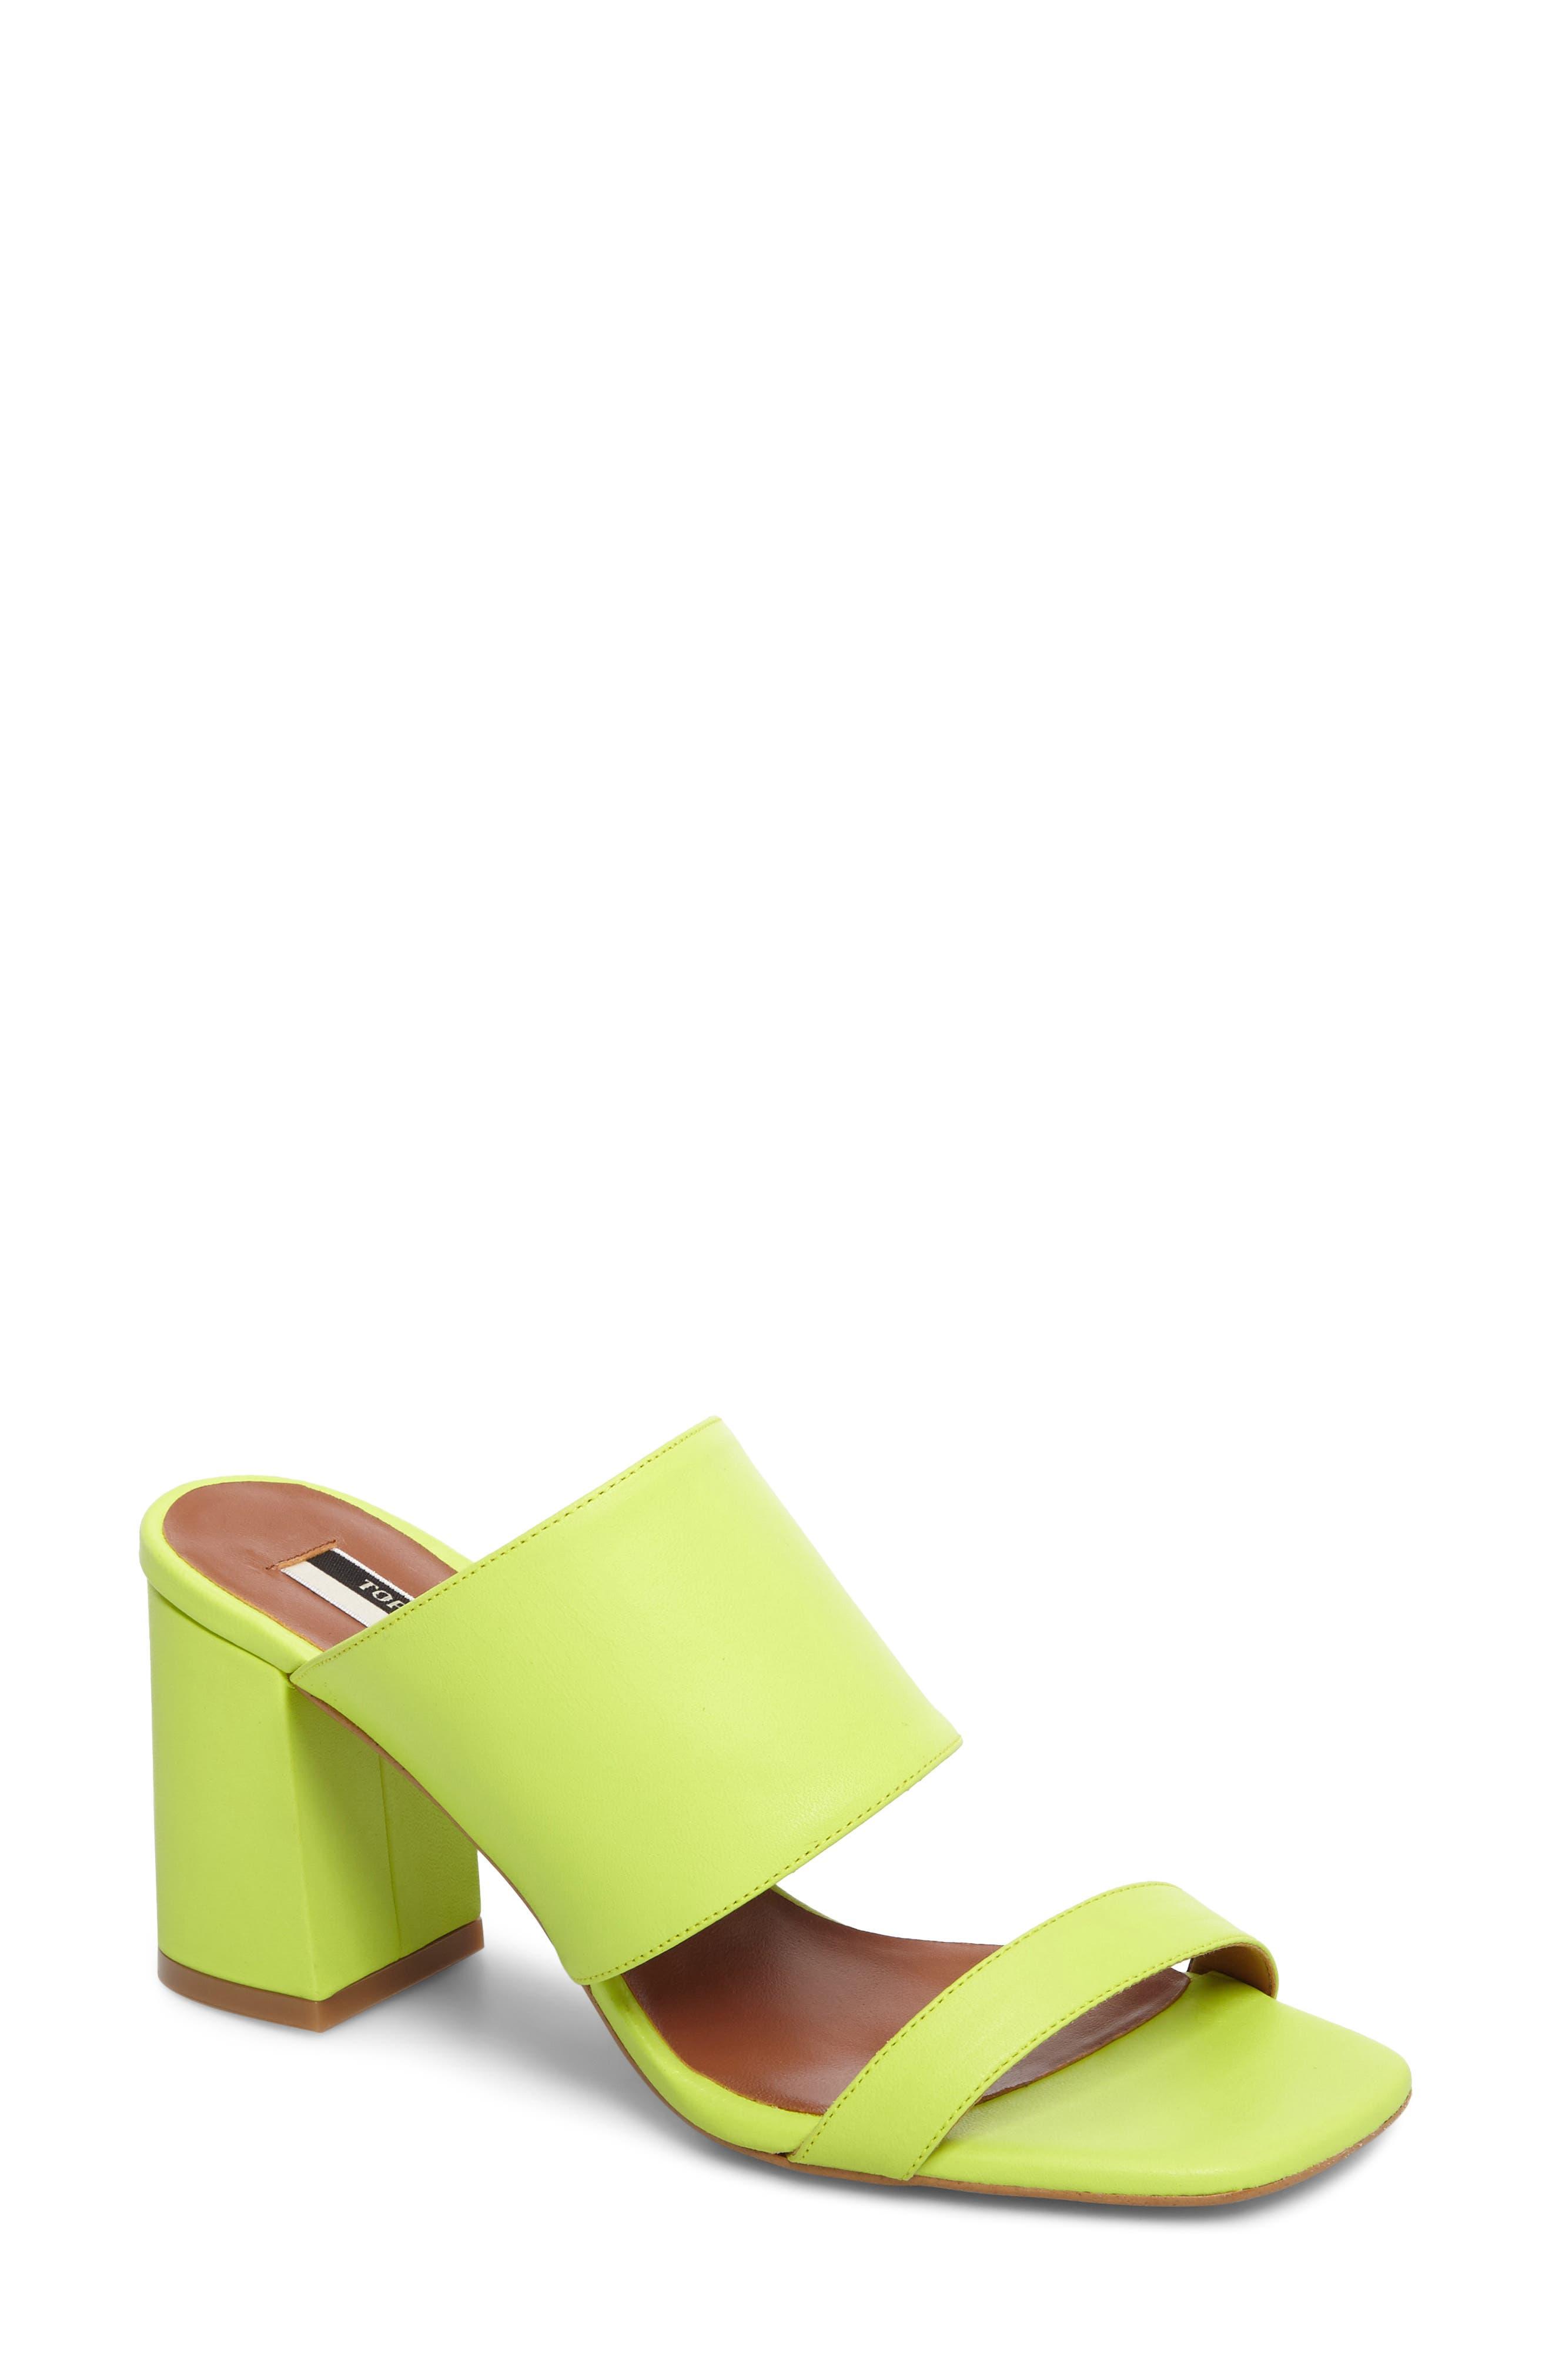 Nickle Mule Sandal,                         Main,                         color, 301